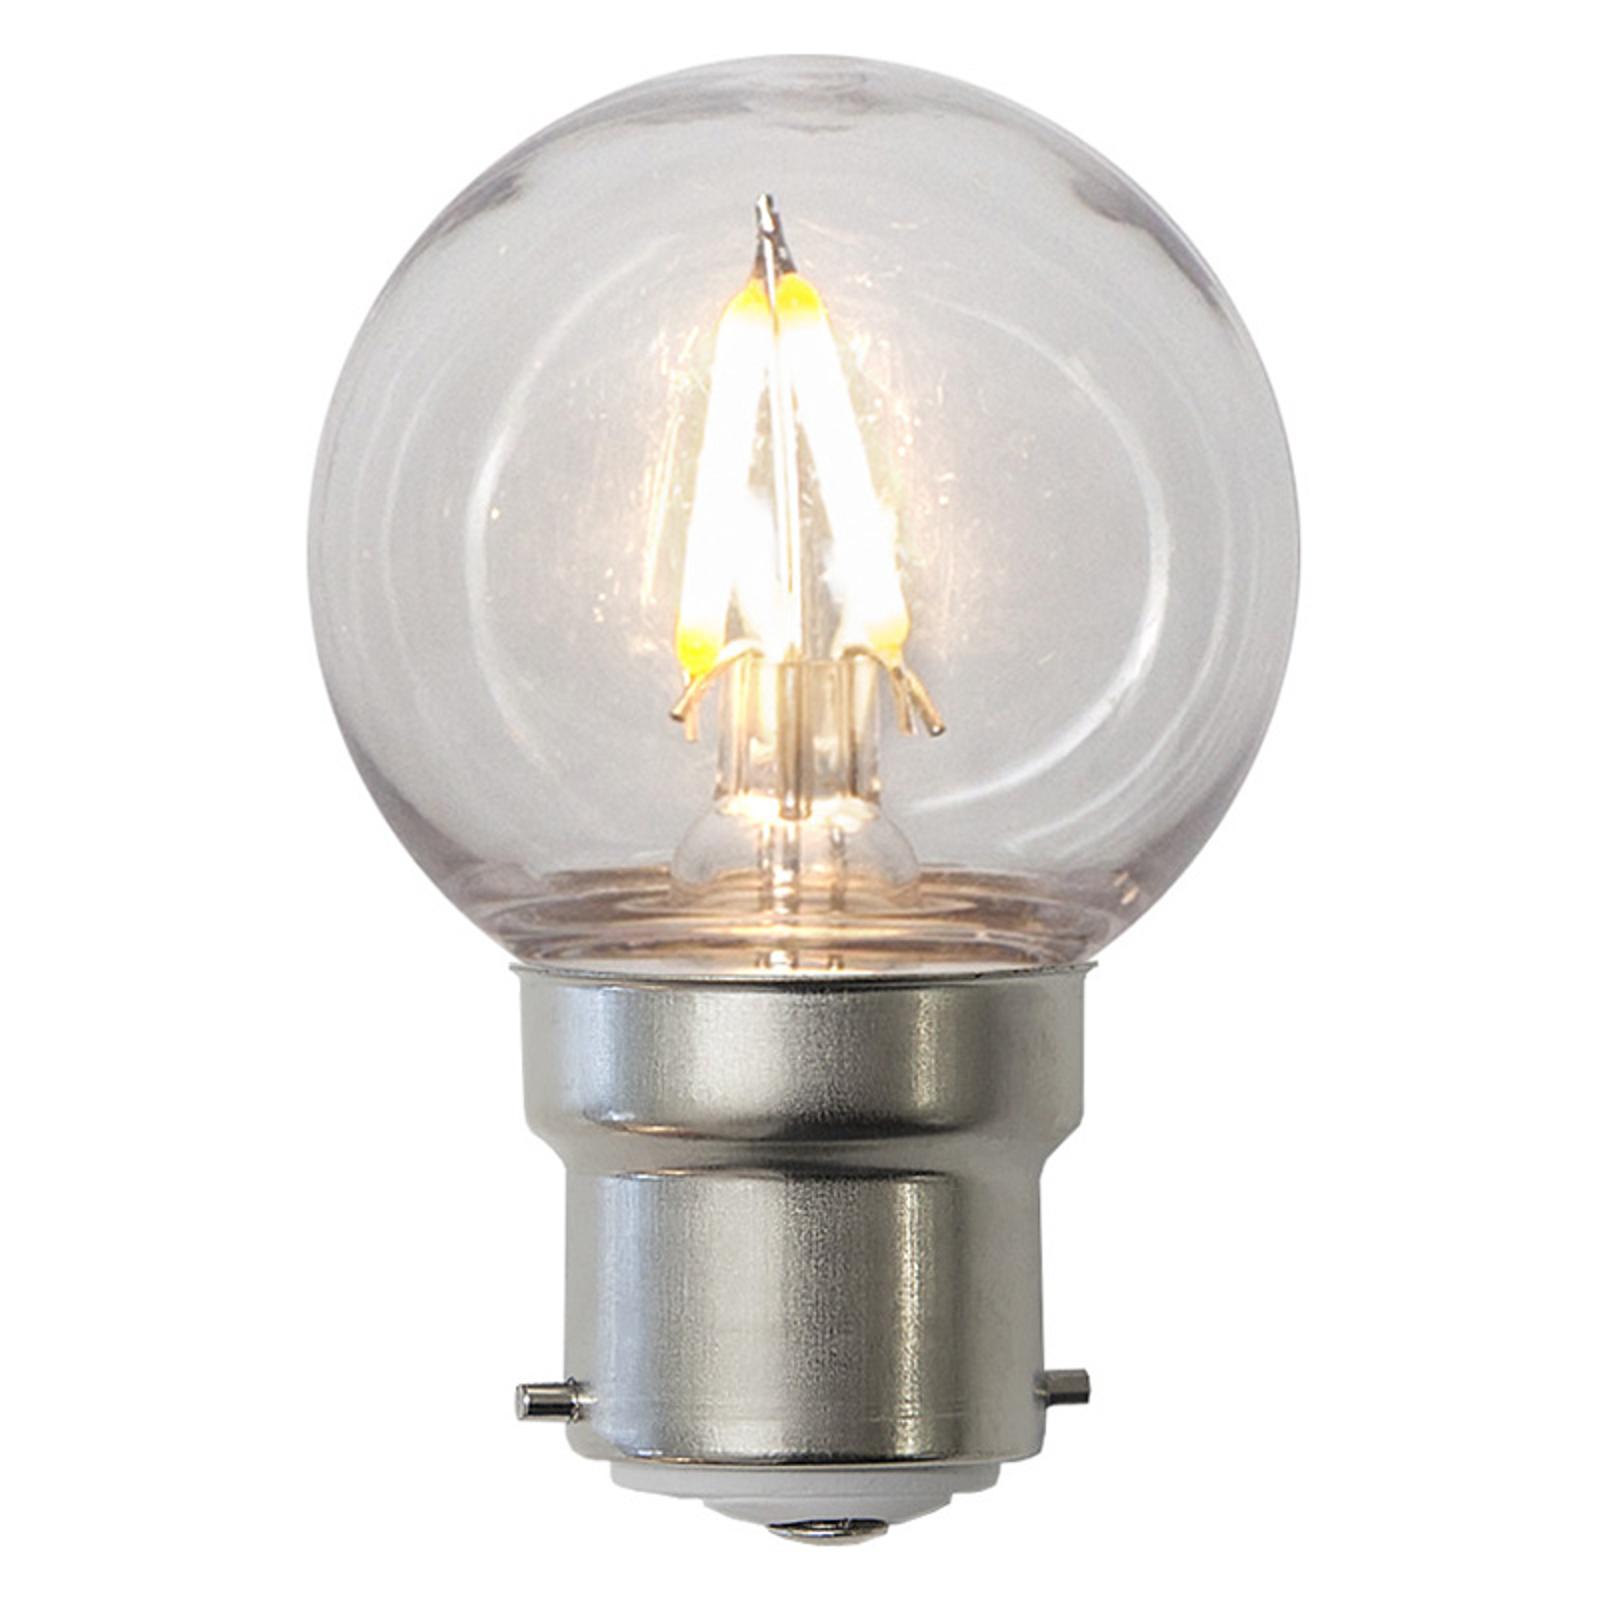 LED-Lampe B22 G45 1,3W, bruchsicher, klar, IP60